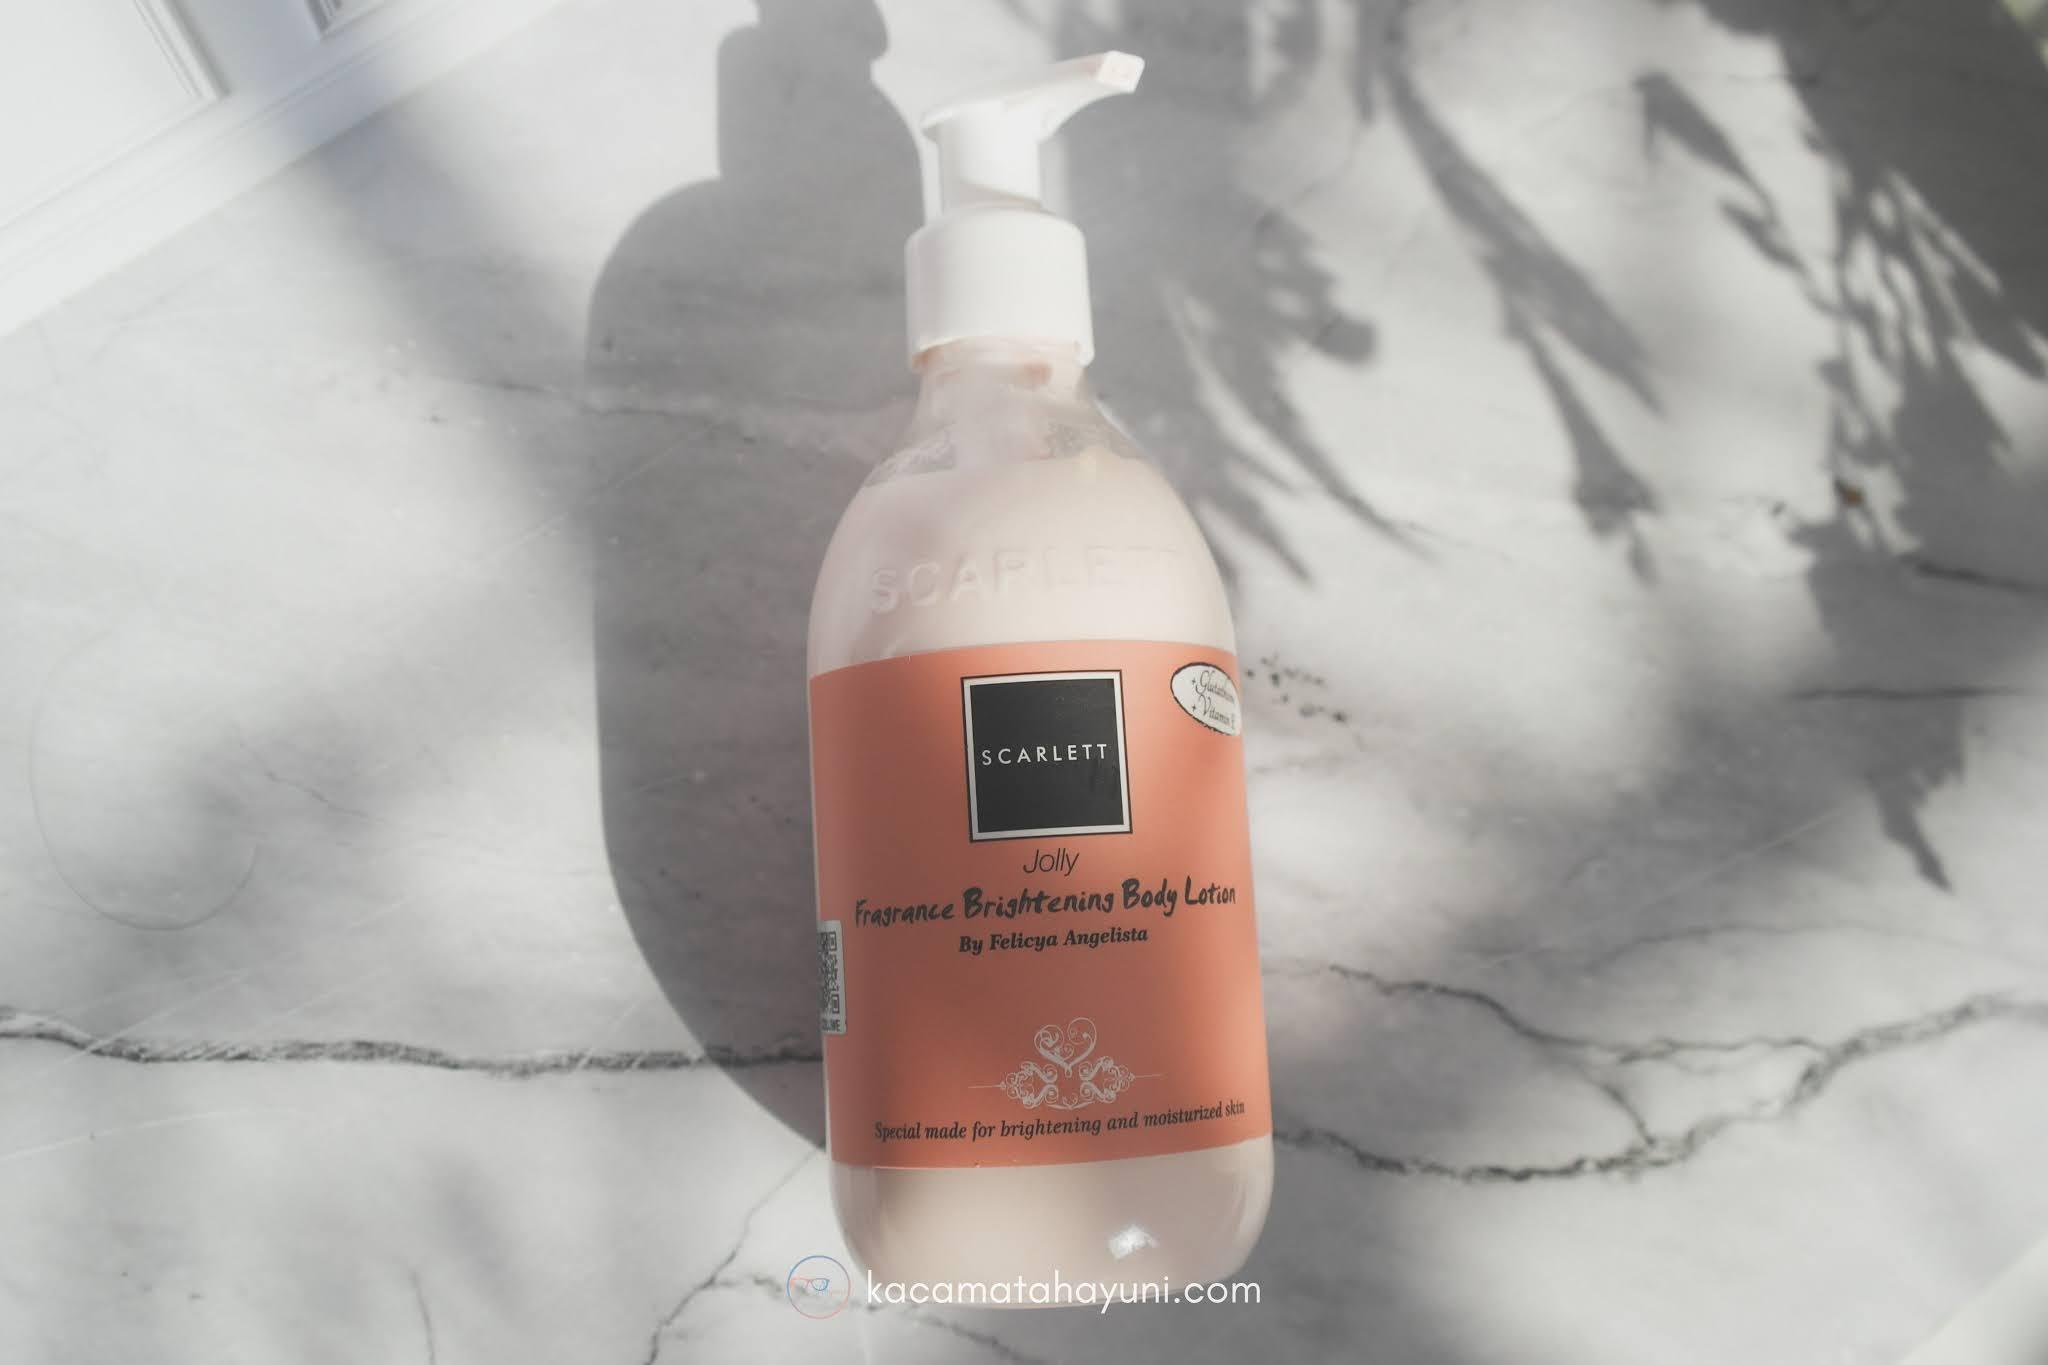 review-scarlett-body-lotion-jolly